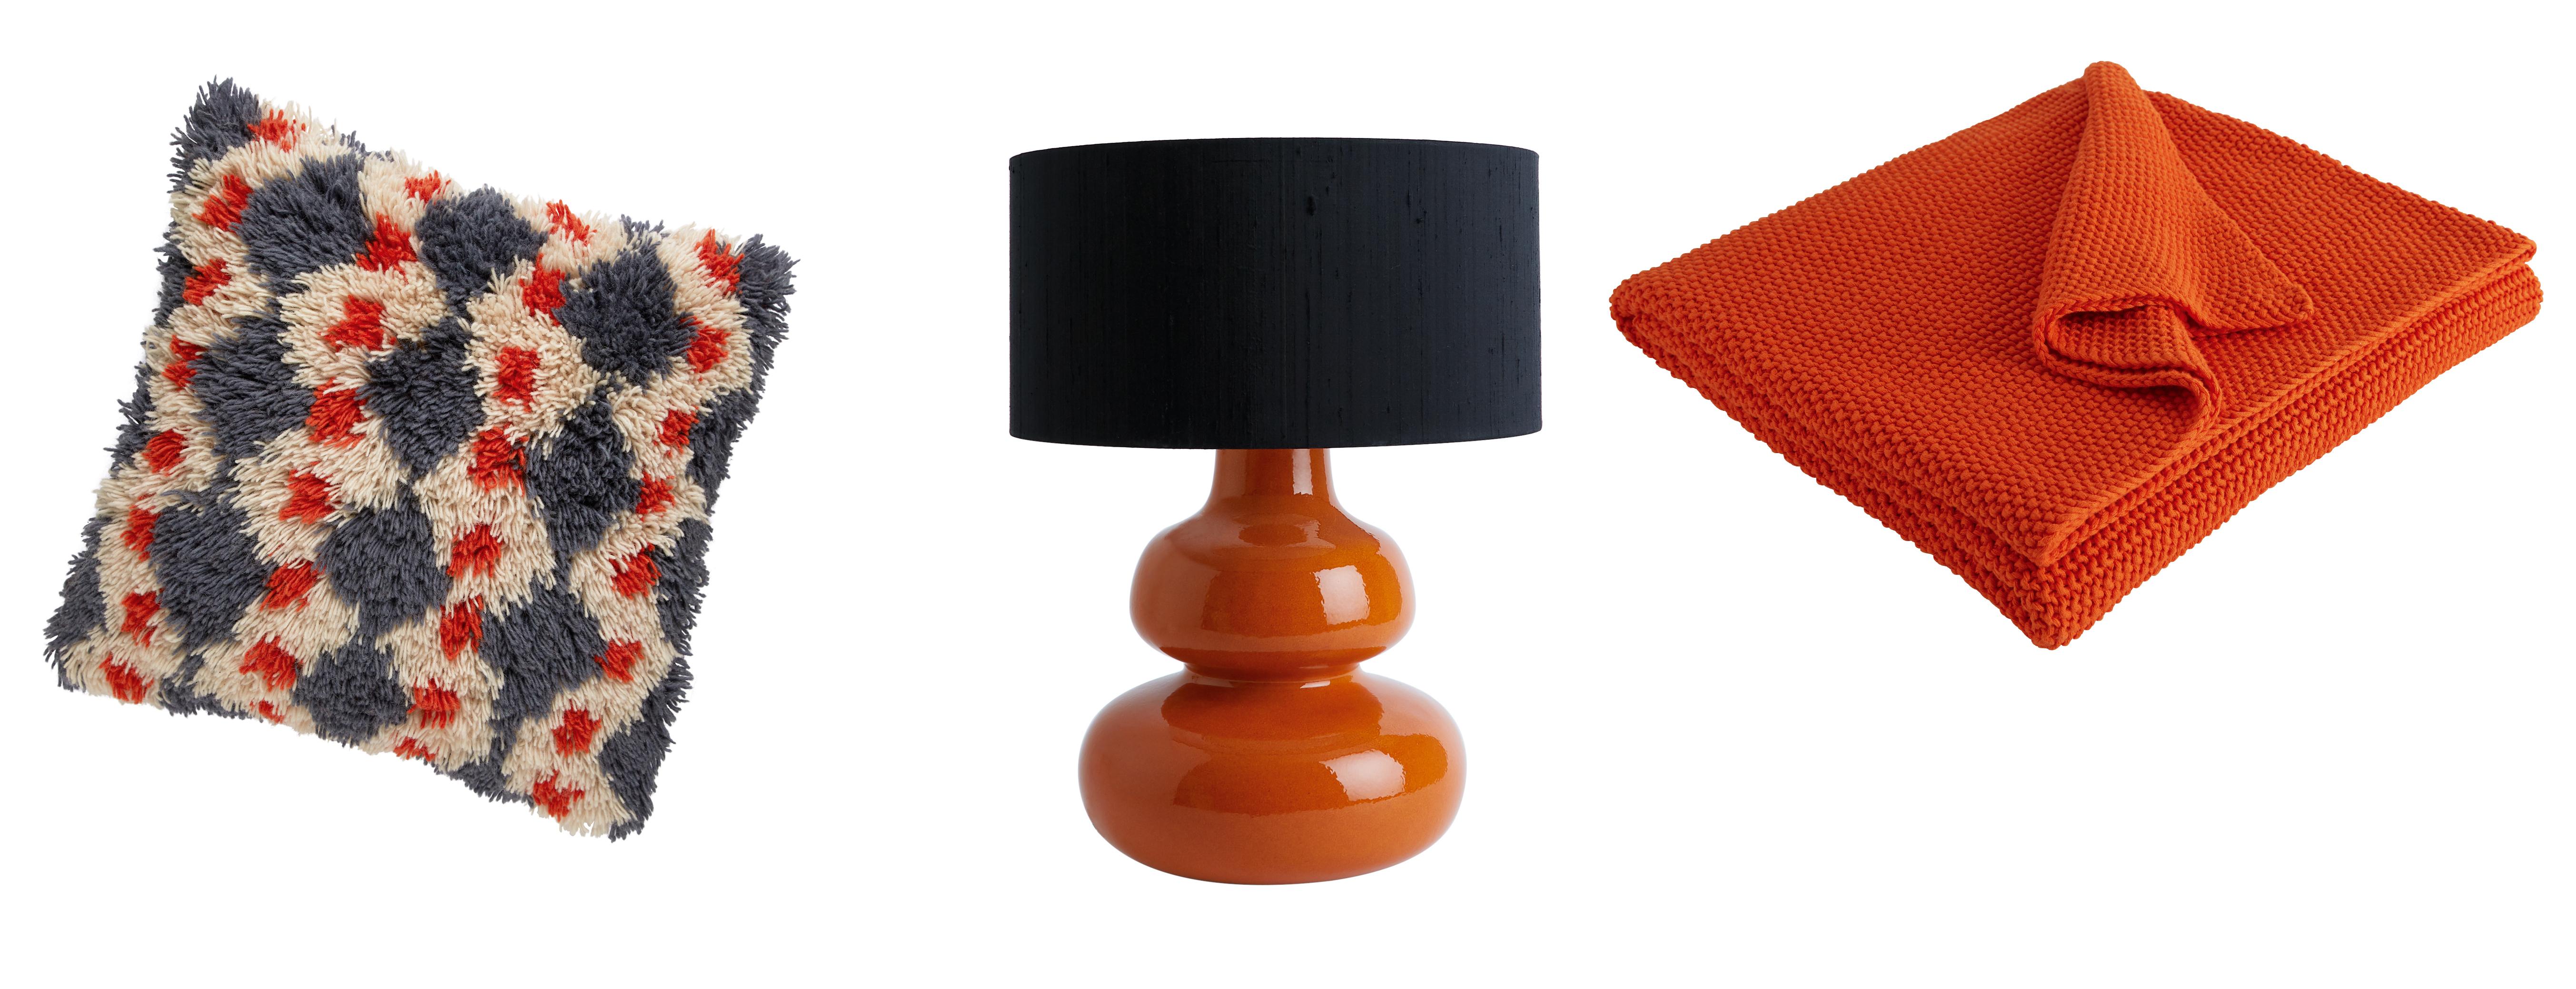 (L-R) Casper Charcoal & Orange Geometric Shaggy Pile Cushion, currently reduced to £35 from £70; Lantana Orange Curvy Lamp With Black Drum Silk Shade, £115, Habitat (Habitat/PA)